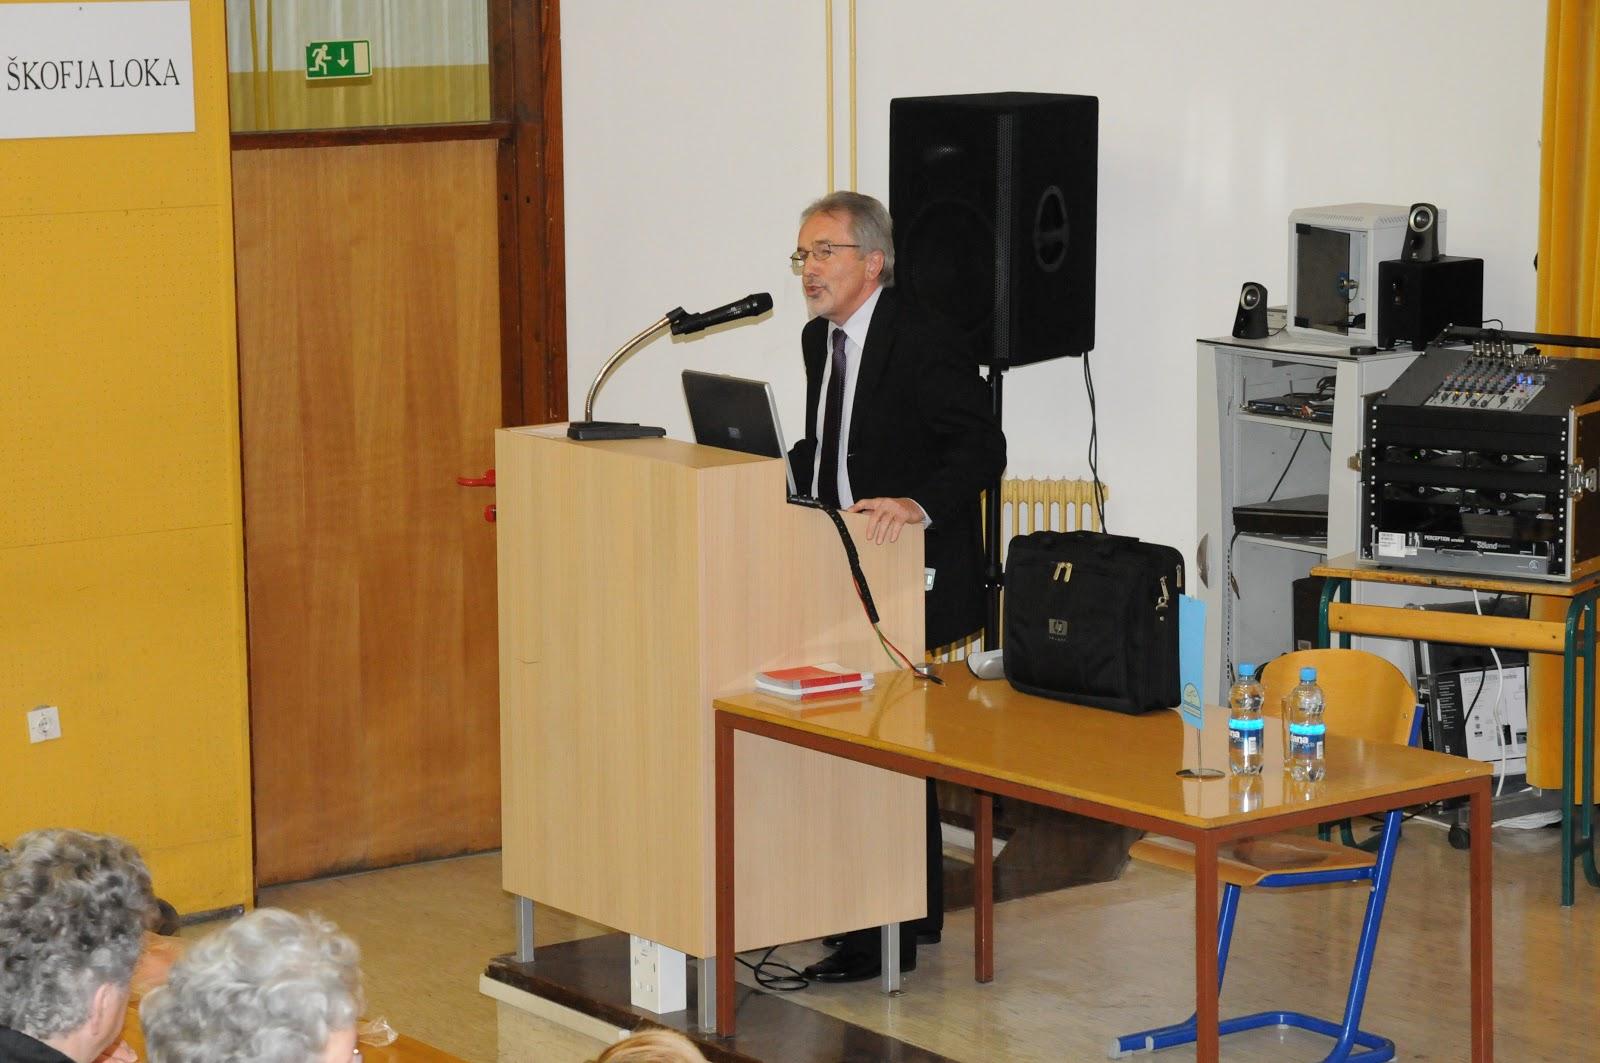 Predavanje, dr. Camlek - oktober 2011 - DSC_3866.JPG